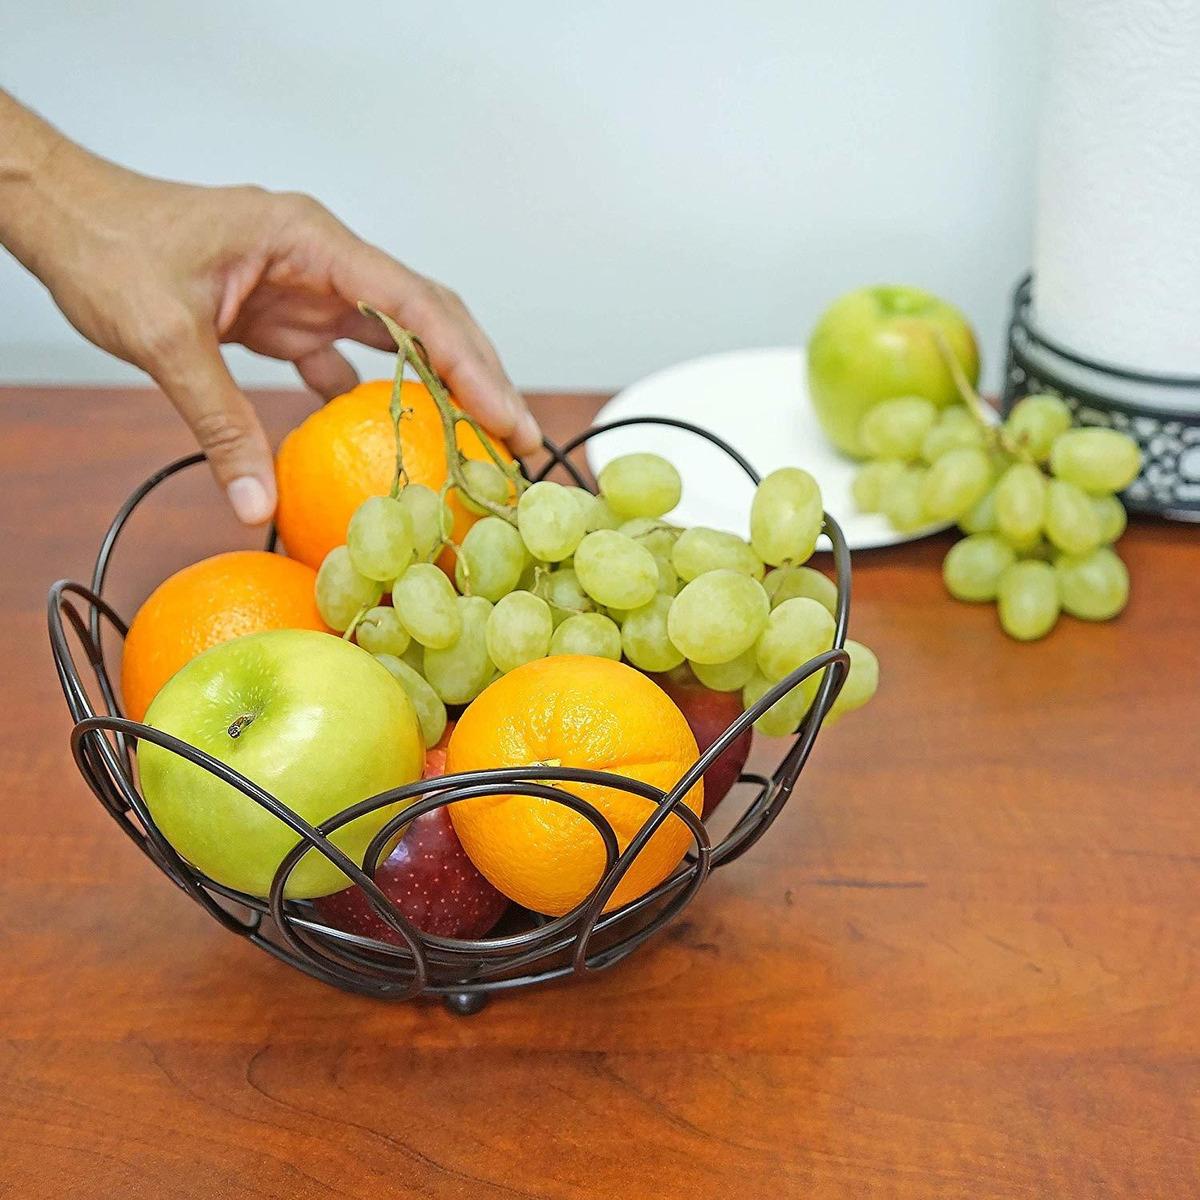 Southern Homewares SH-10237 Fruit Basket Aged Bronze One Size